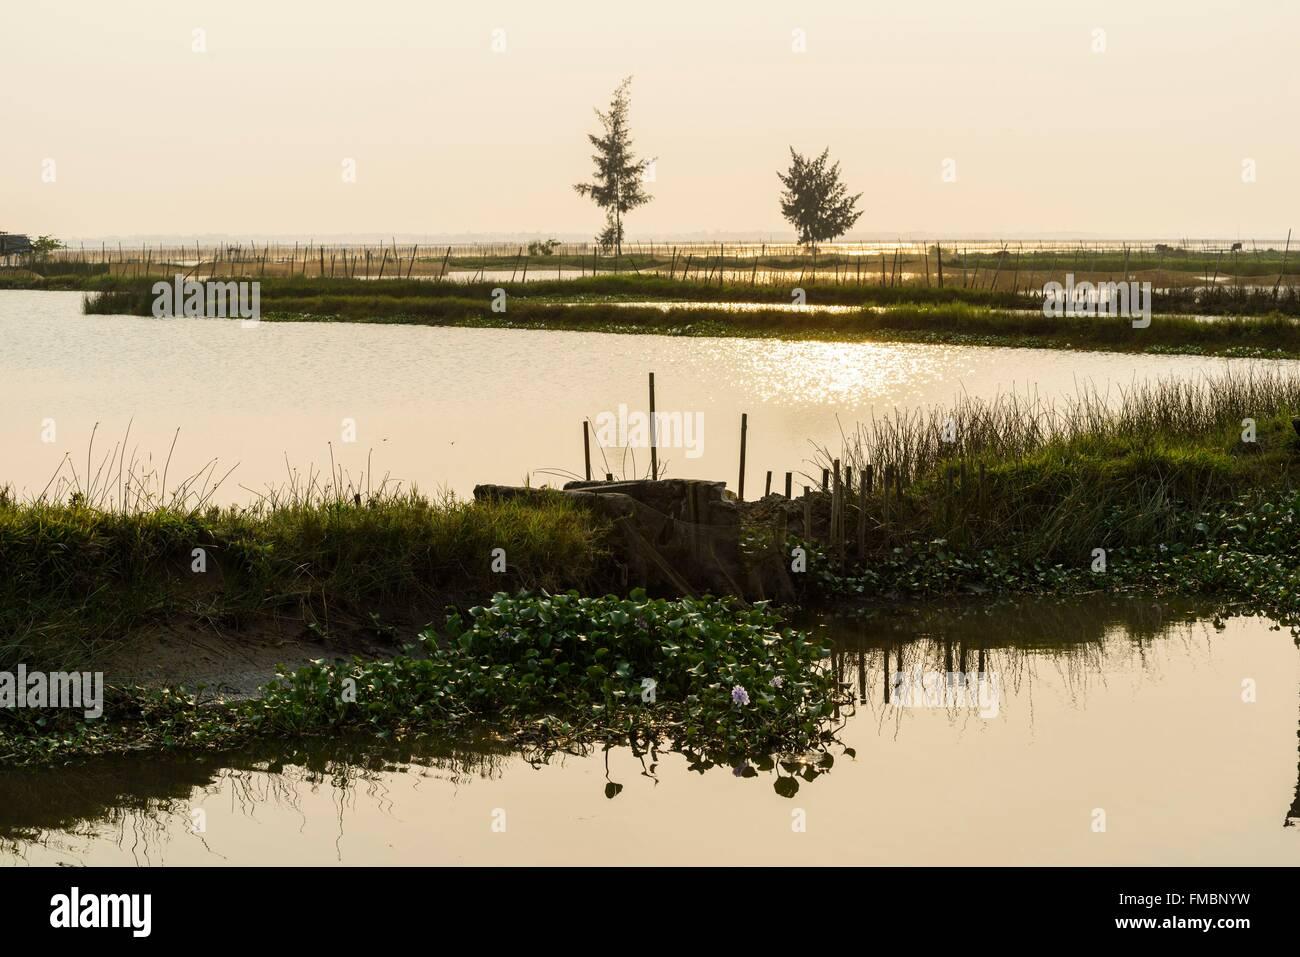 Vietnam, Thua Thien Hue province, Tam Giang lagoon - Stock Image